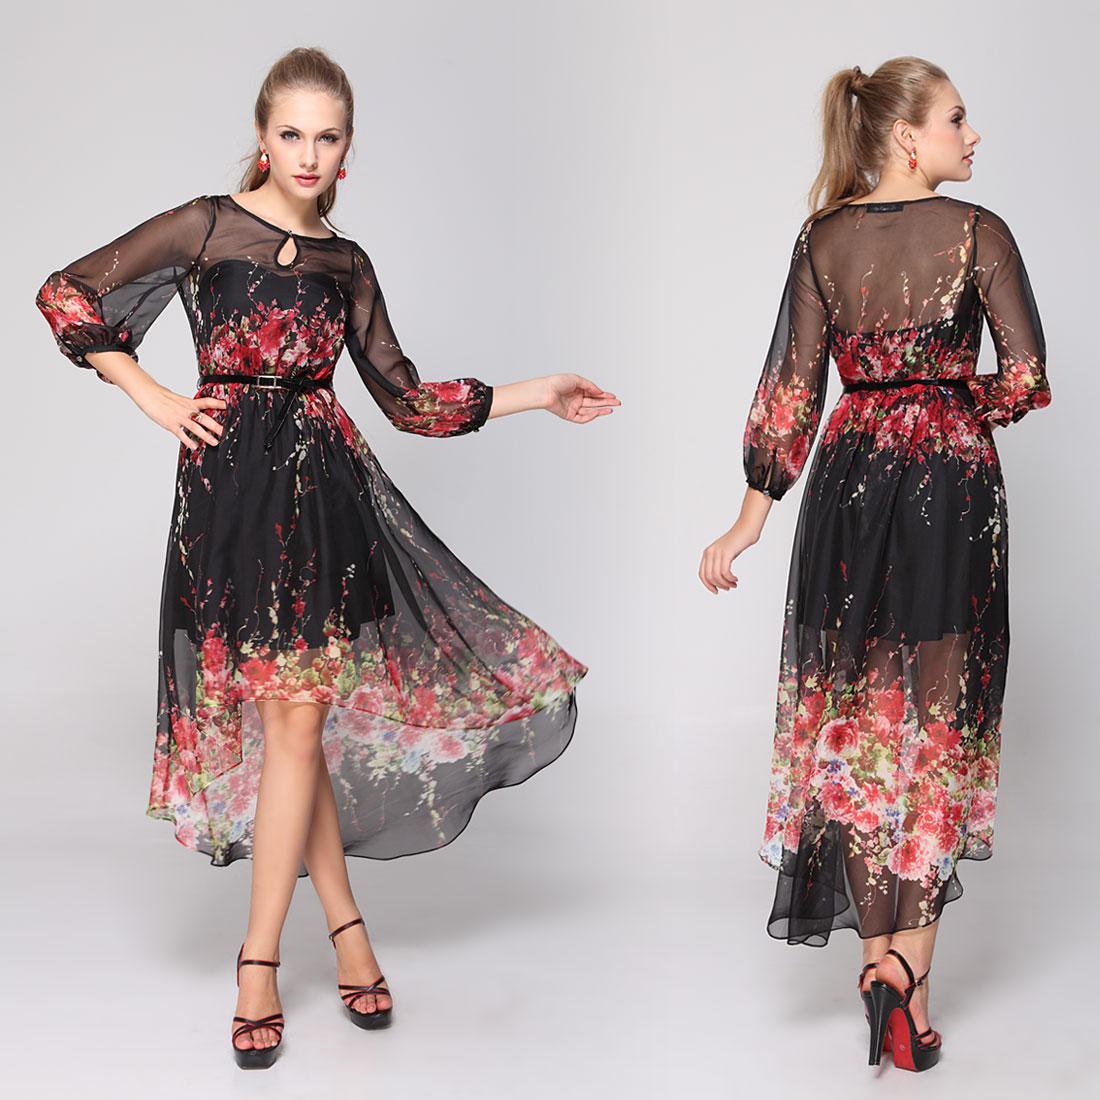 фото вечерних платьев в стиле ретро